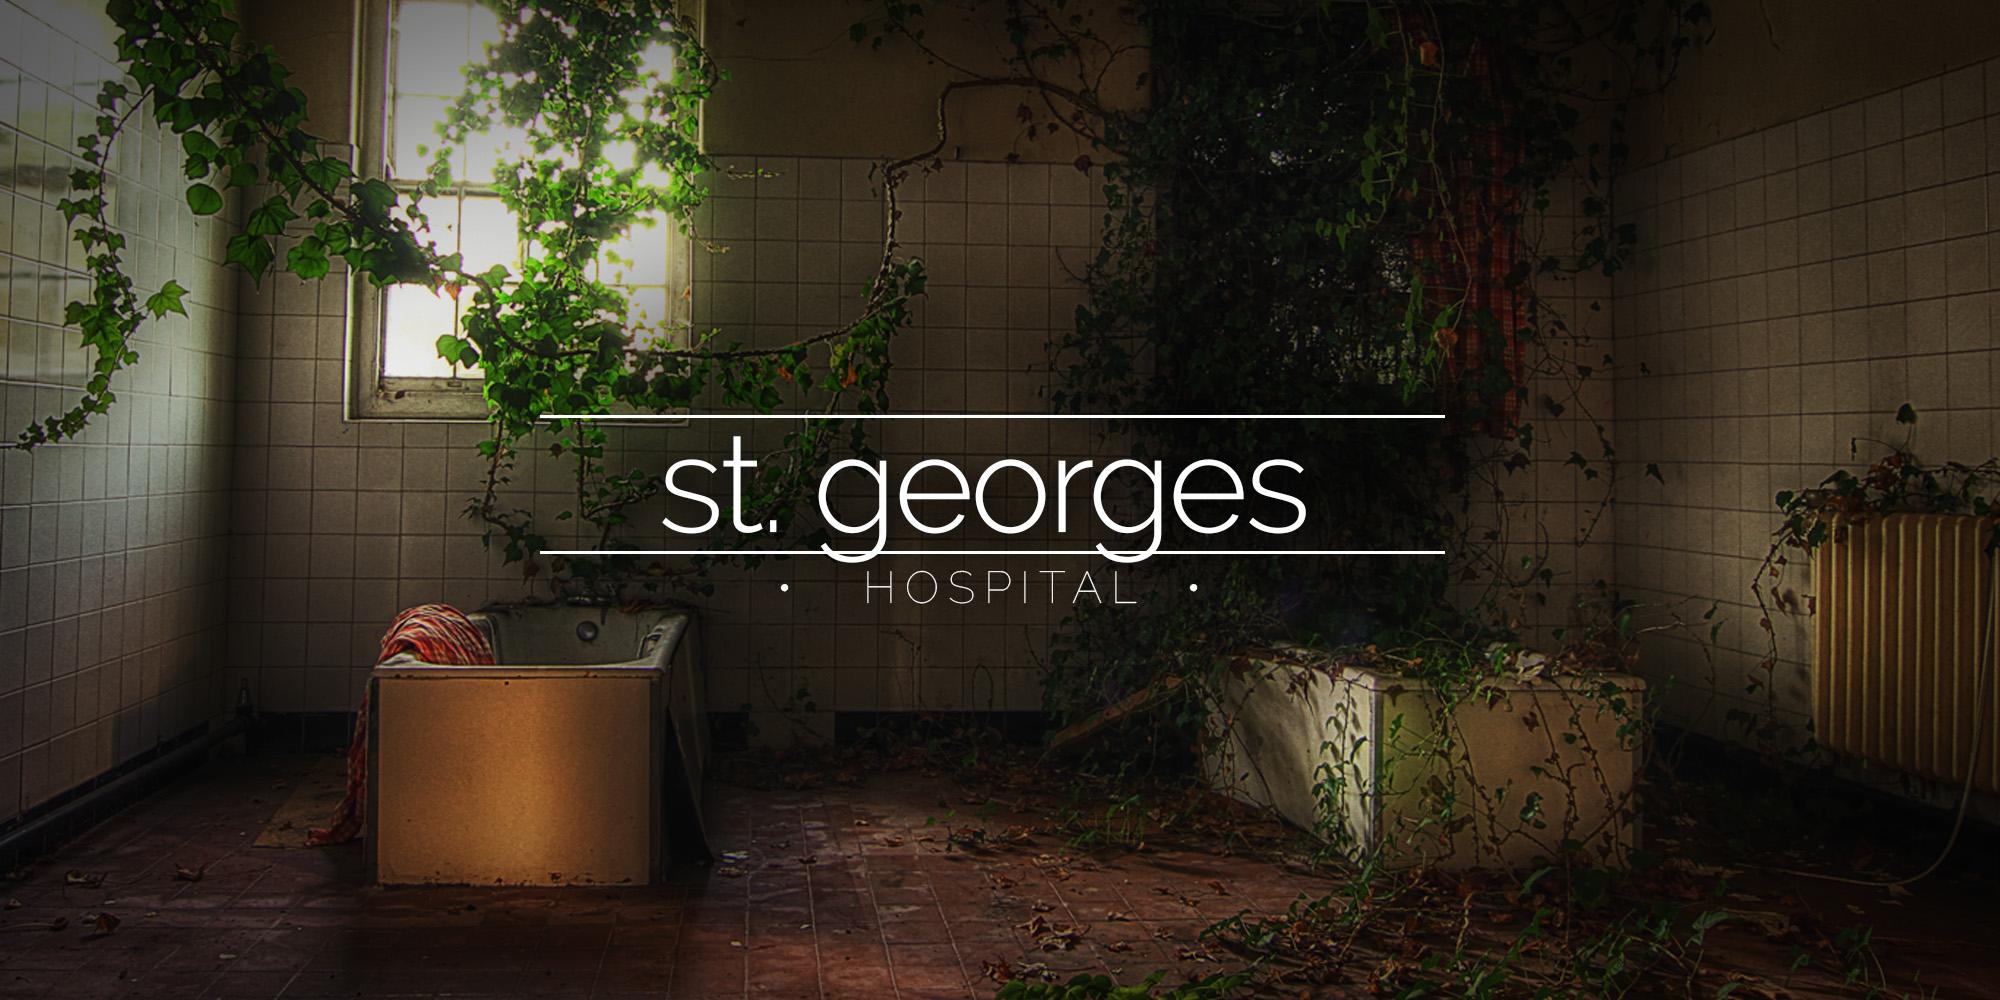 St Georges Hospital - Northumberland Lunatic Asylum, Morpeth